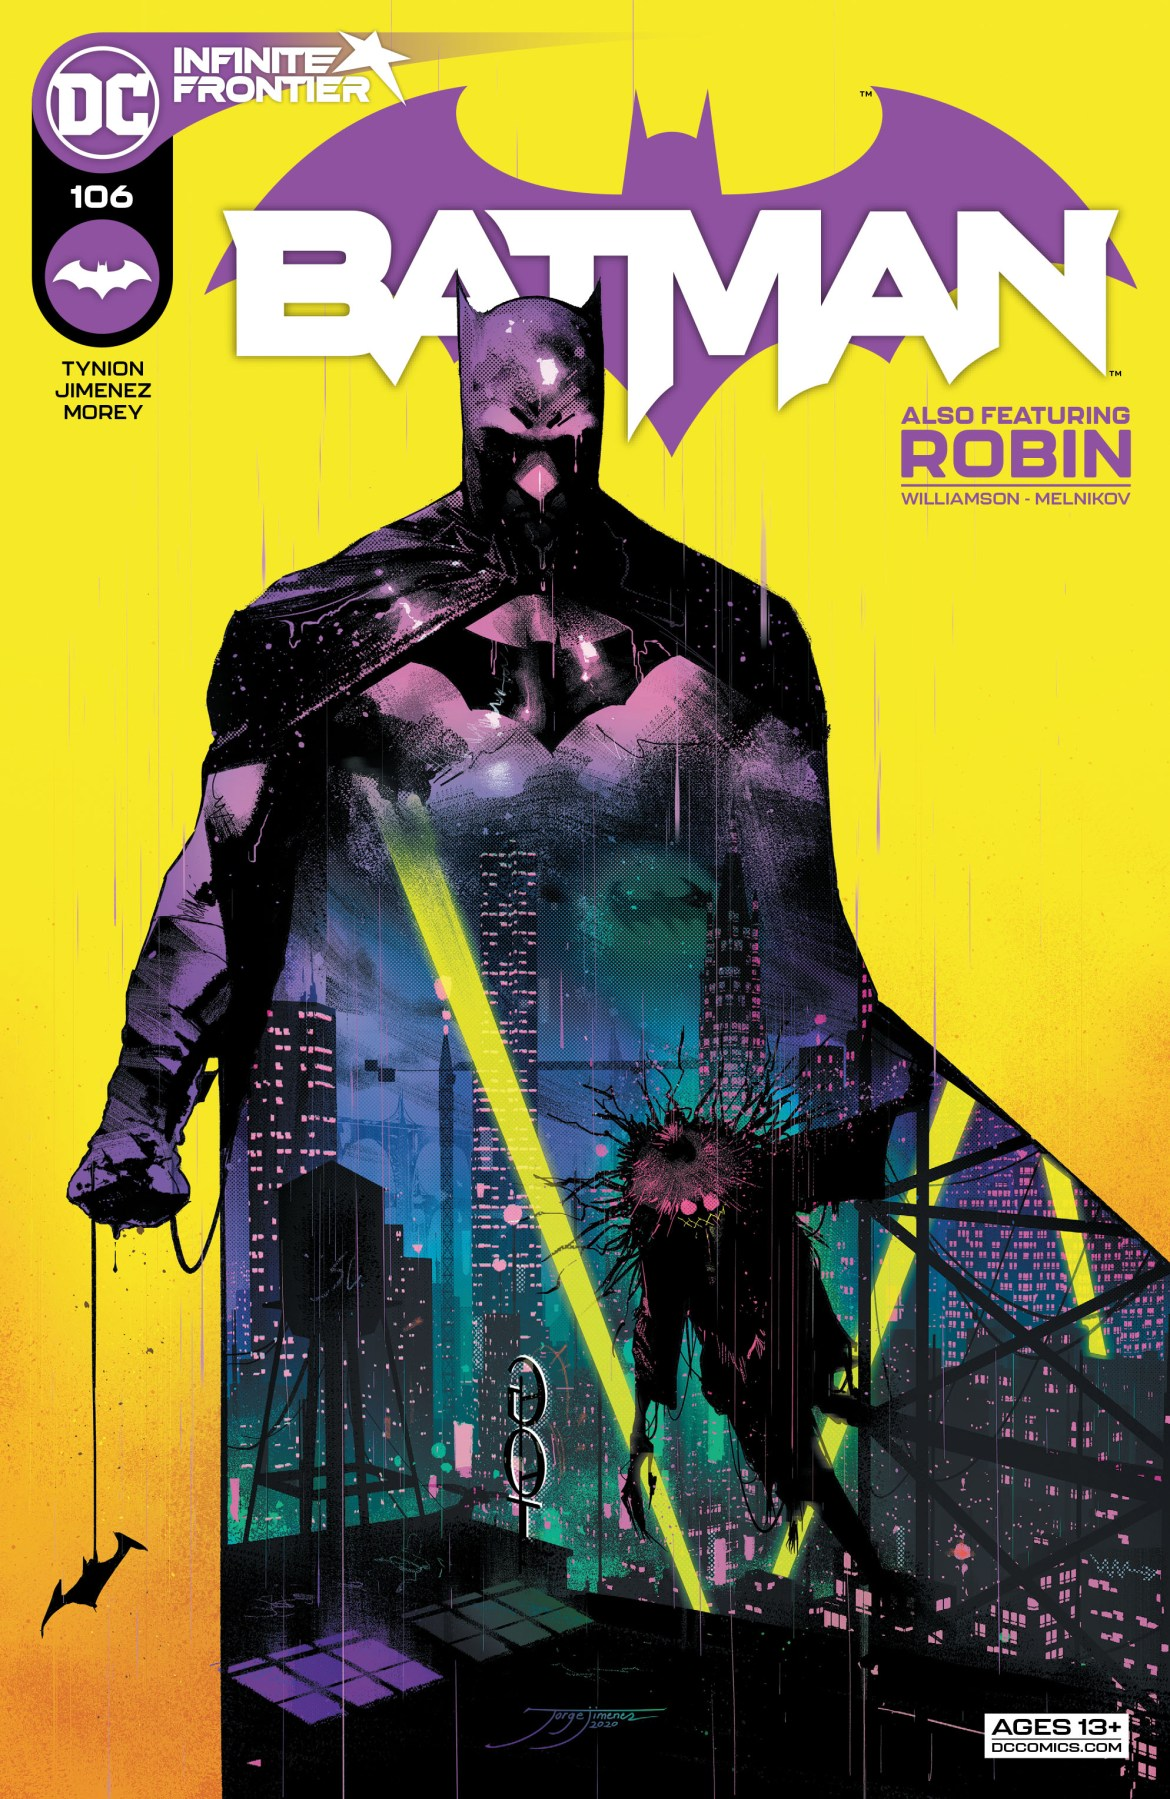 0121DC027 ComicList: DC Comics New Releases for 03/03/2021